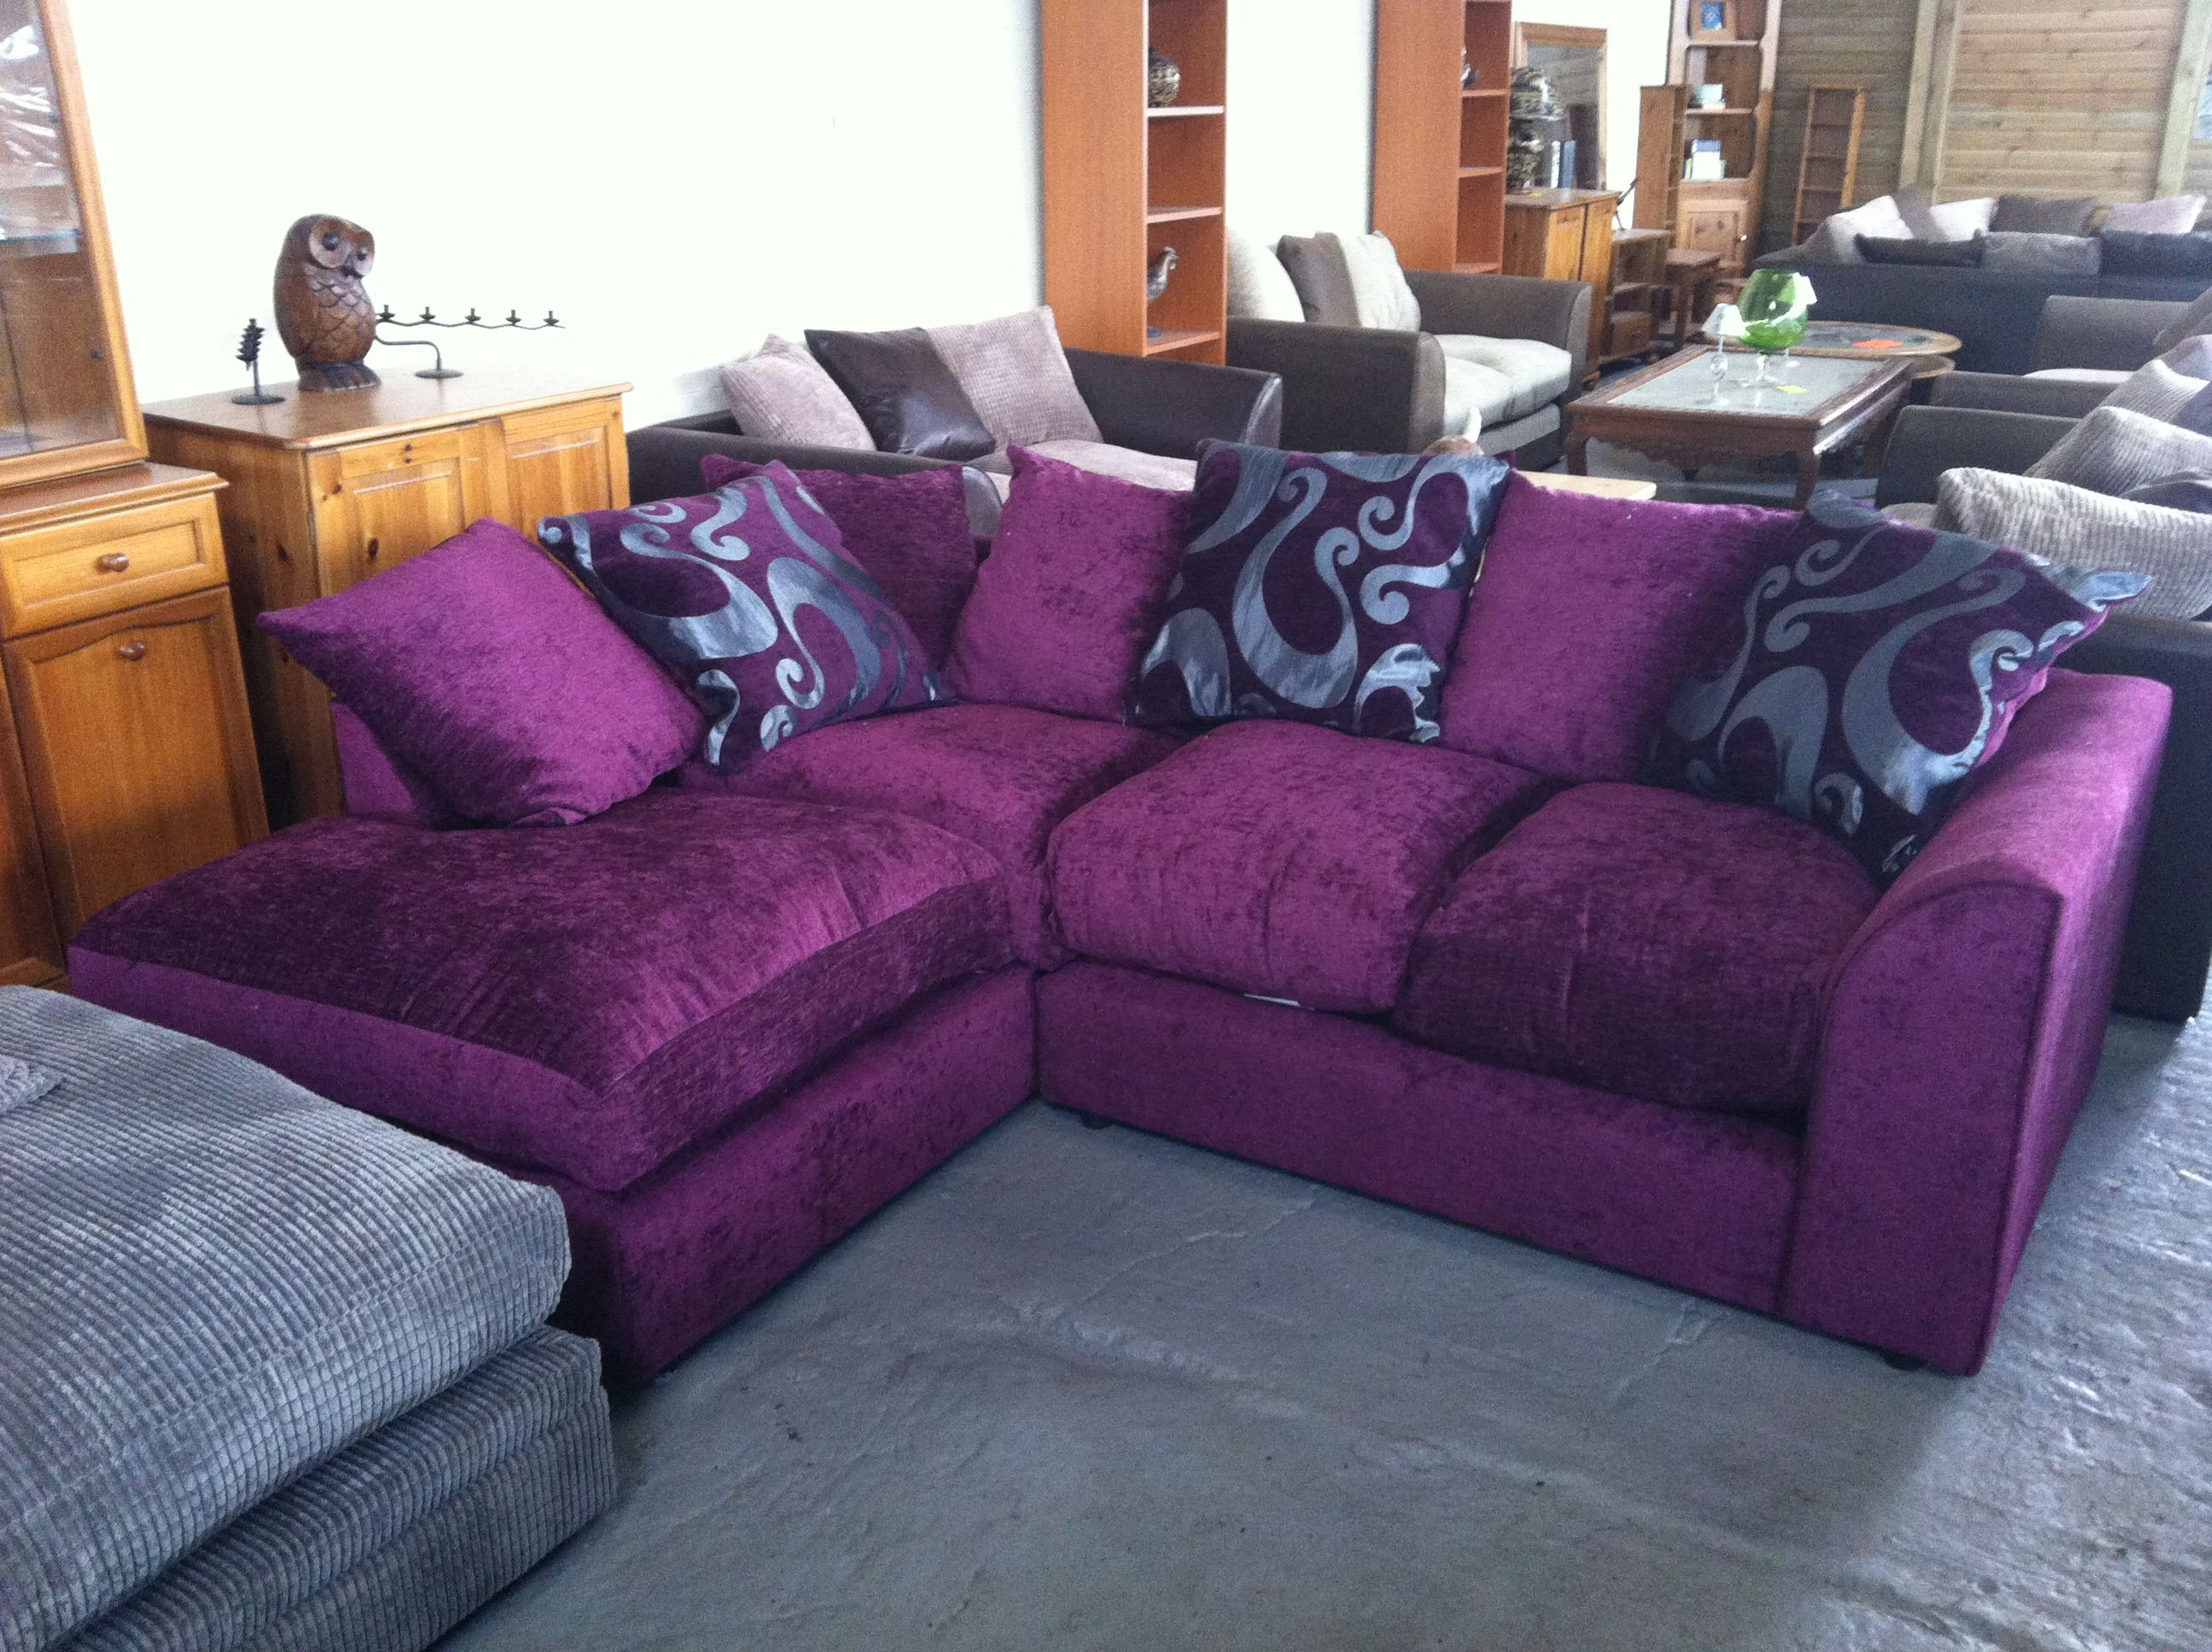 Sweet L-shaped Velvet Purple Sofa On Gray Rug As Decorate ...